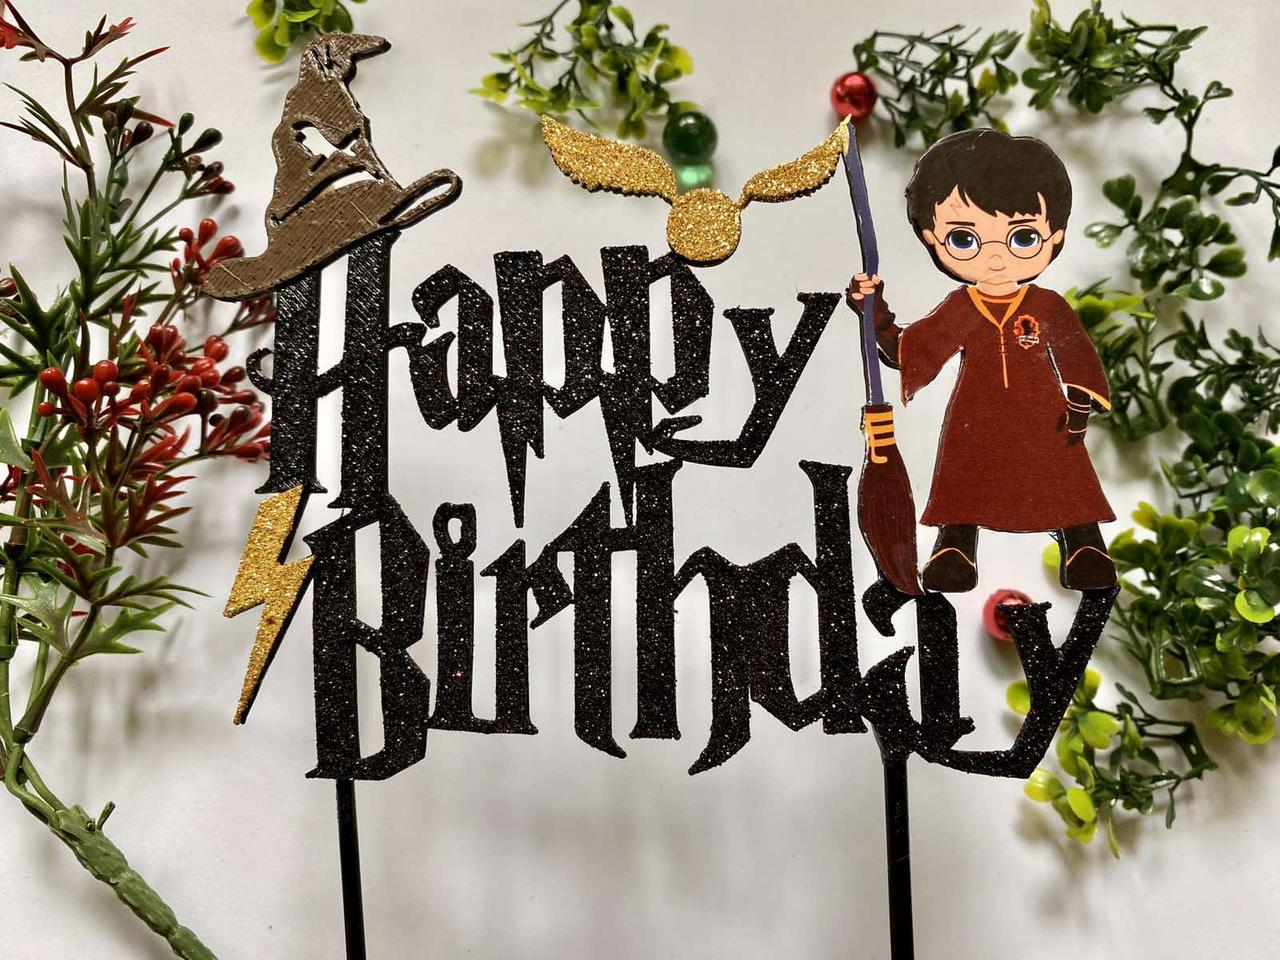 Топпер Гаррі Поттер, Топпер Harry Potter, Топпер Happy Birthday з принтом Гаррі Поттер